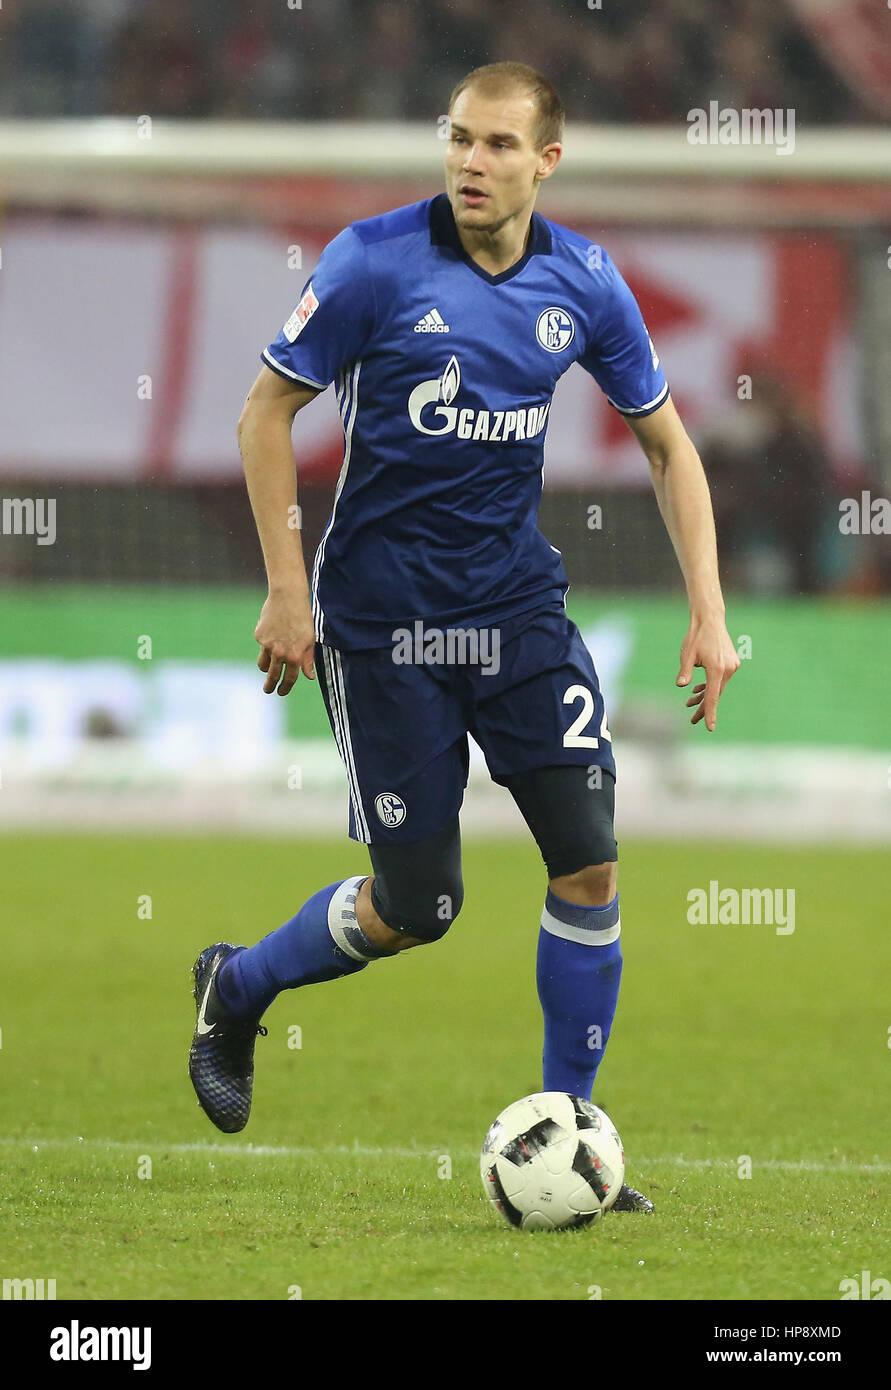 Cologne, Germany, February 19, 2017, Bundesliga matchday 21, 1. FC Koeln - FC Schalke 04:  Holger Badstuber (Schalke) - Stock Image